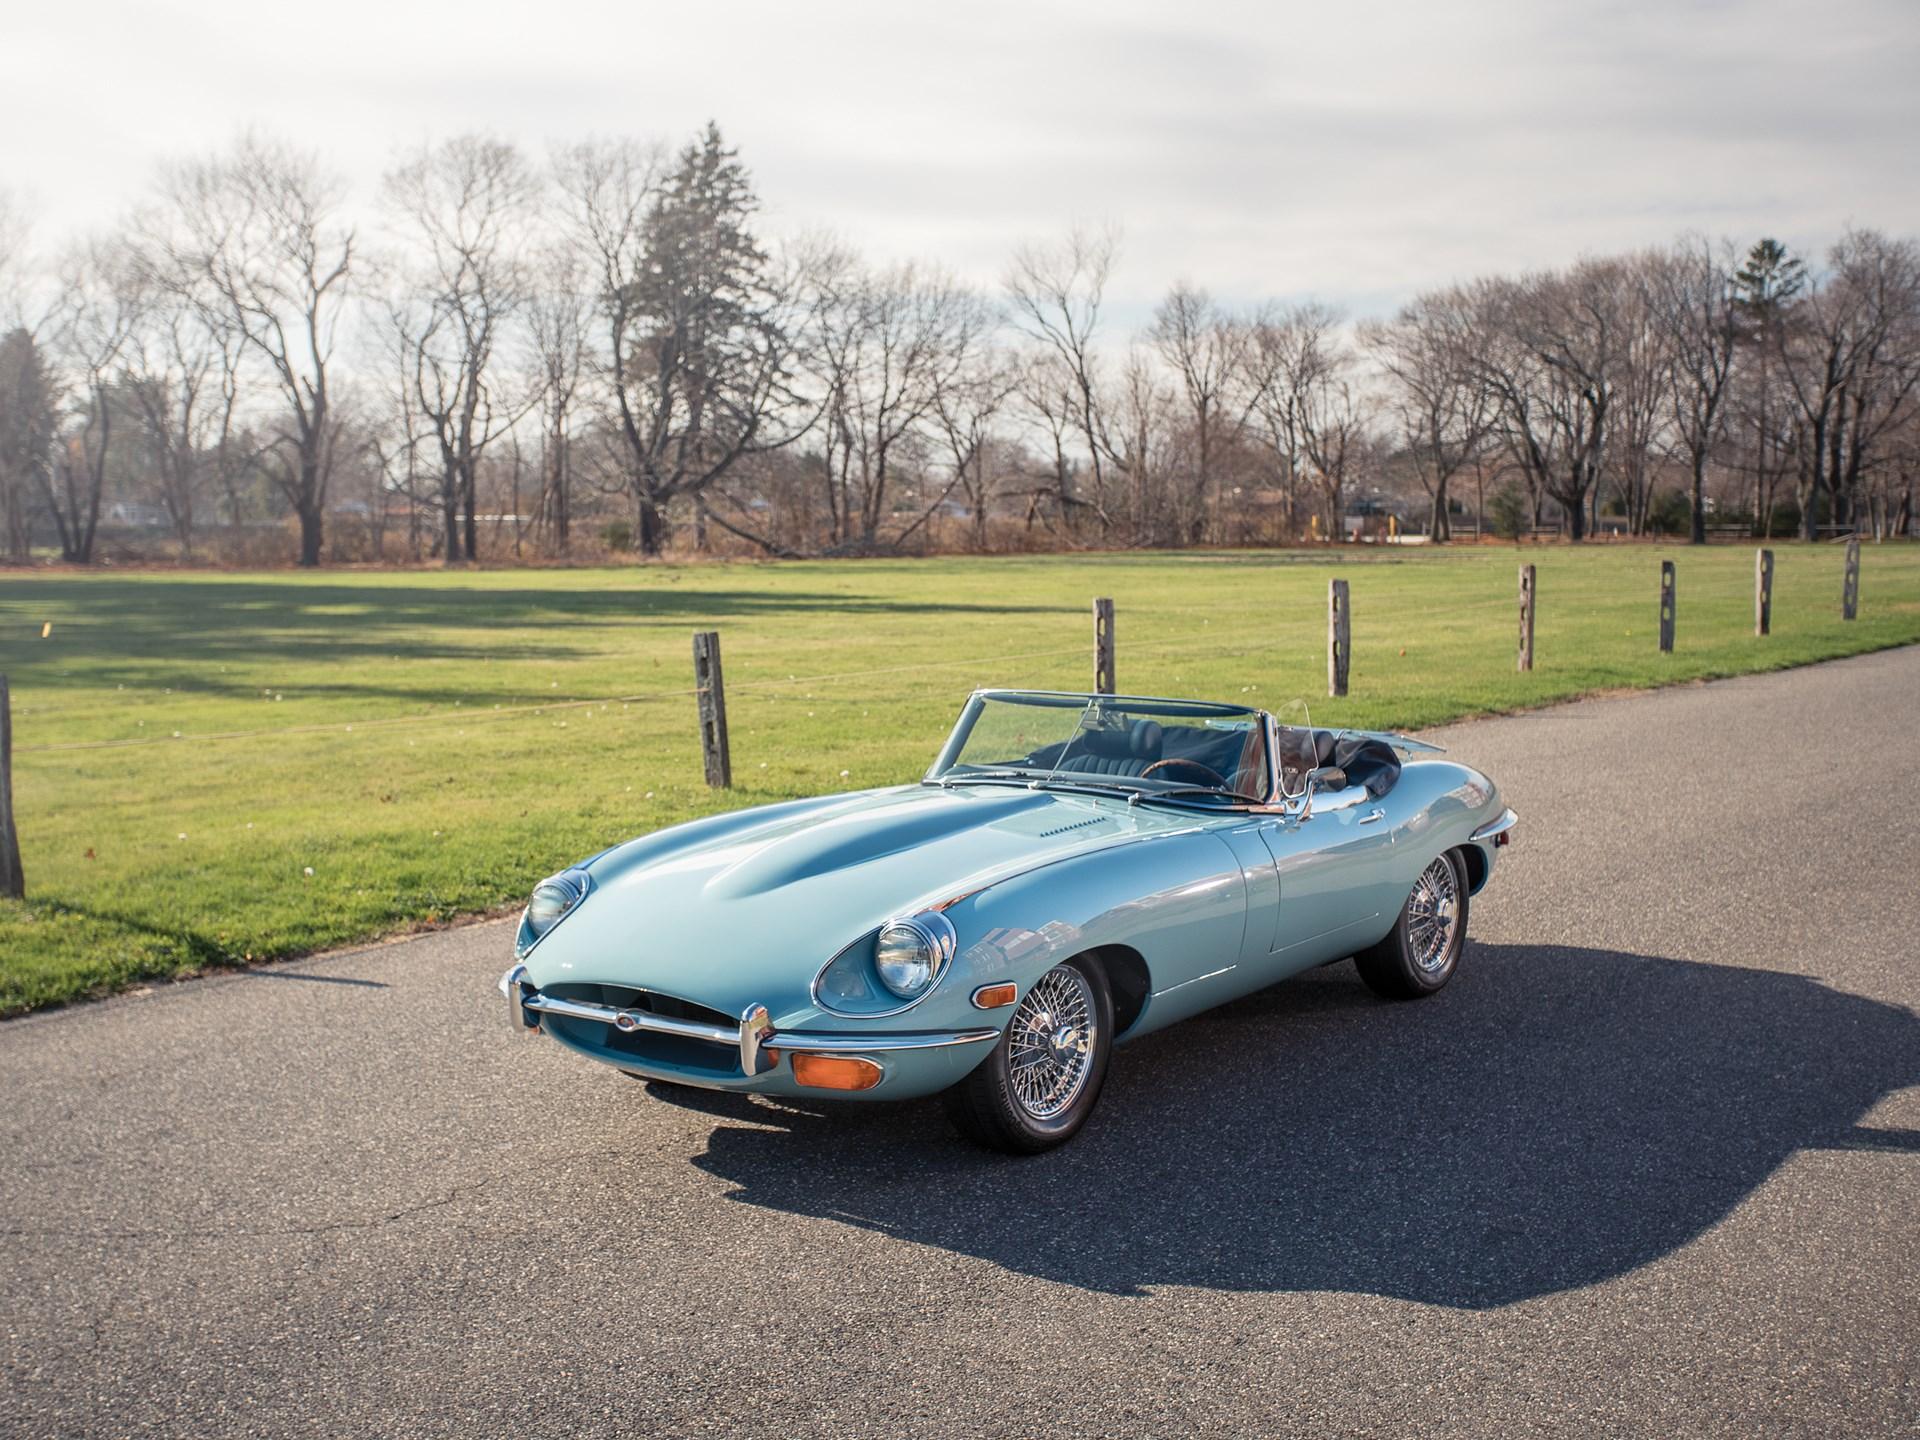 1969 Jaguar E Type Series 2 4.2 Litre Roadster